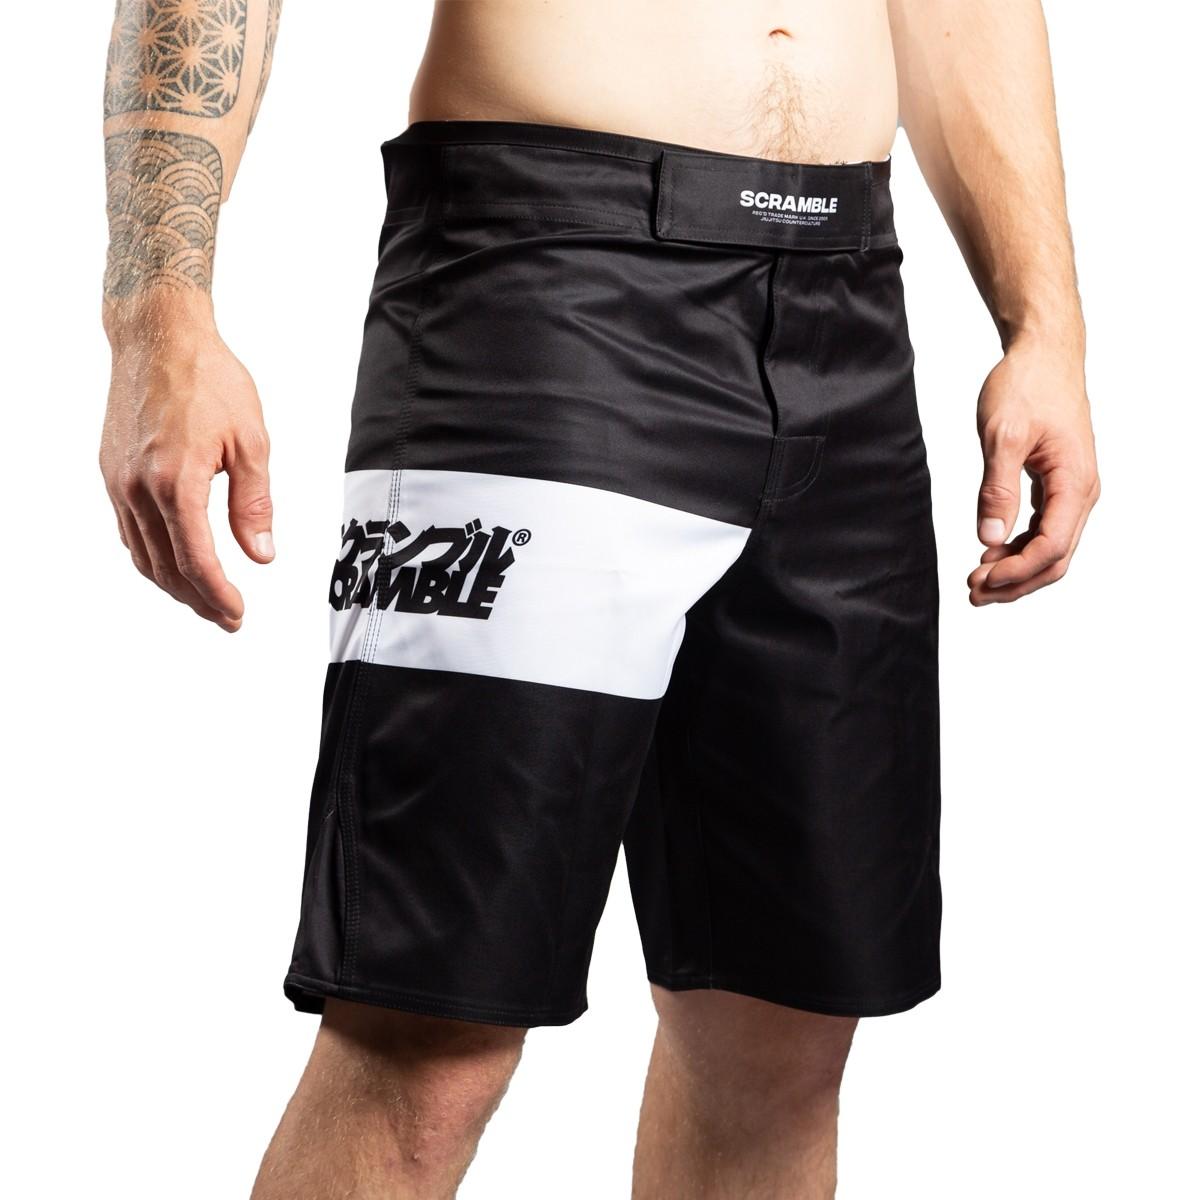 Scramble Rival Fight Shorts - BJJ MMA